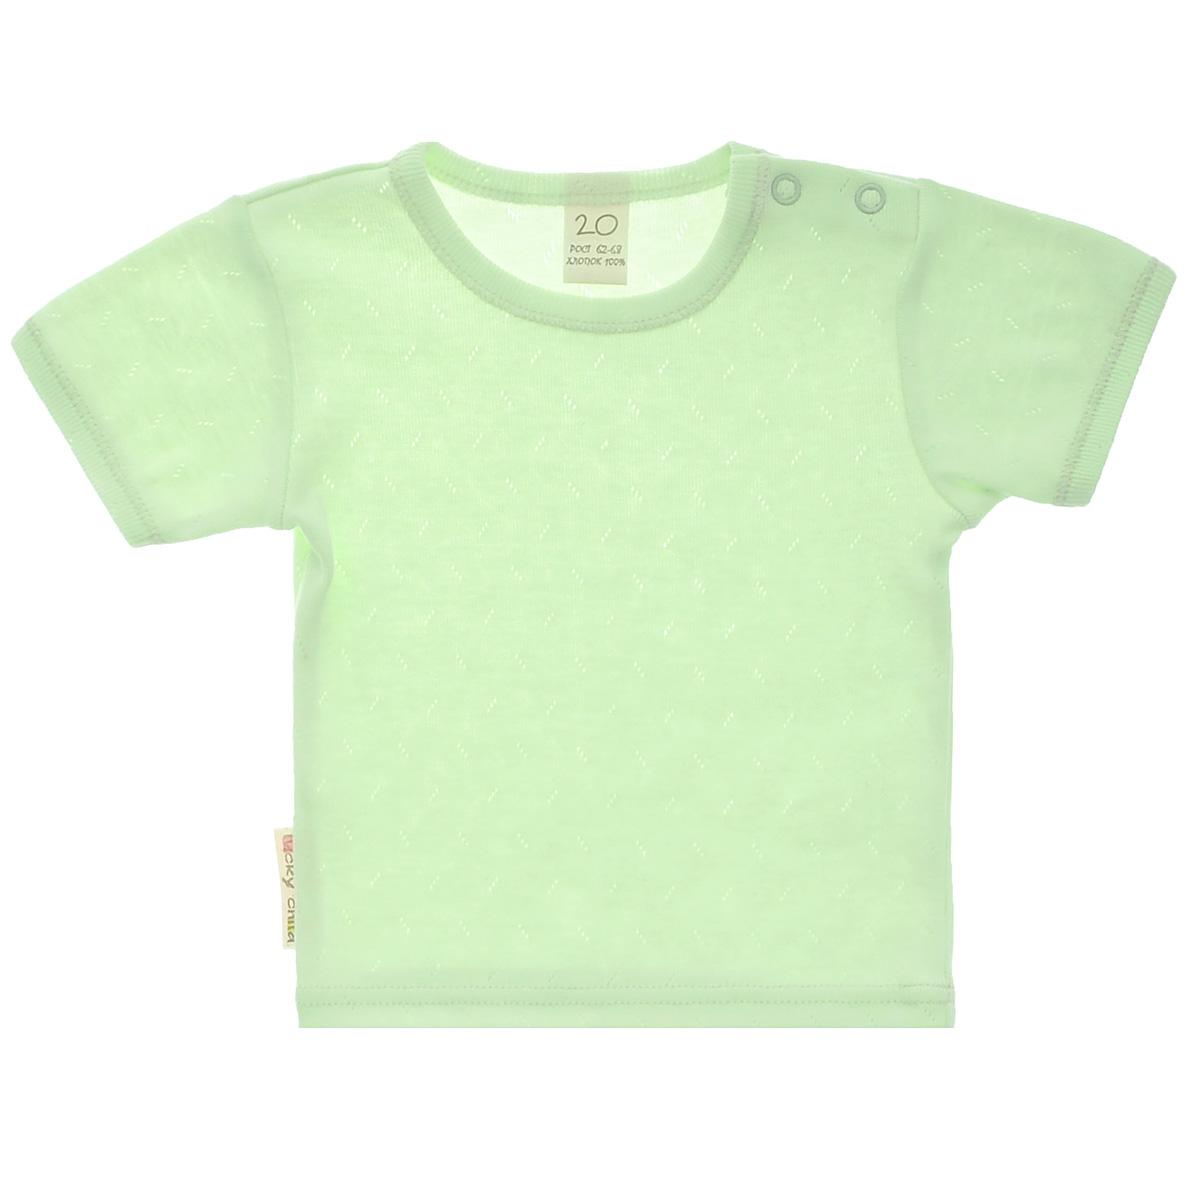 Футболка детская Lucky Child Ажур, цвет: зеленый. 0-26. Размер 74/80